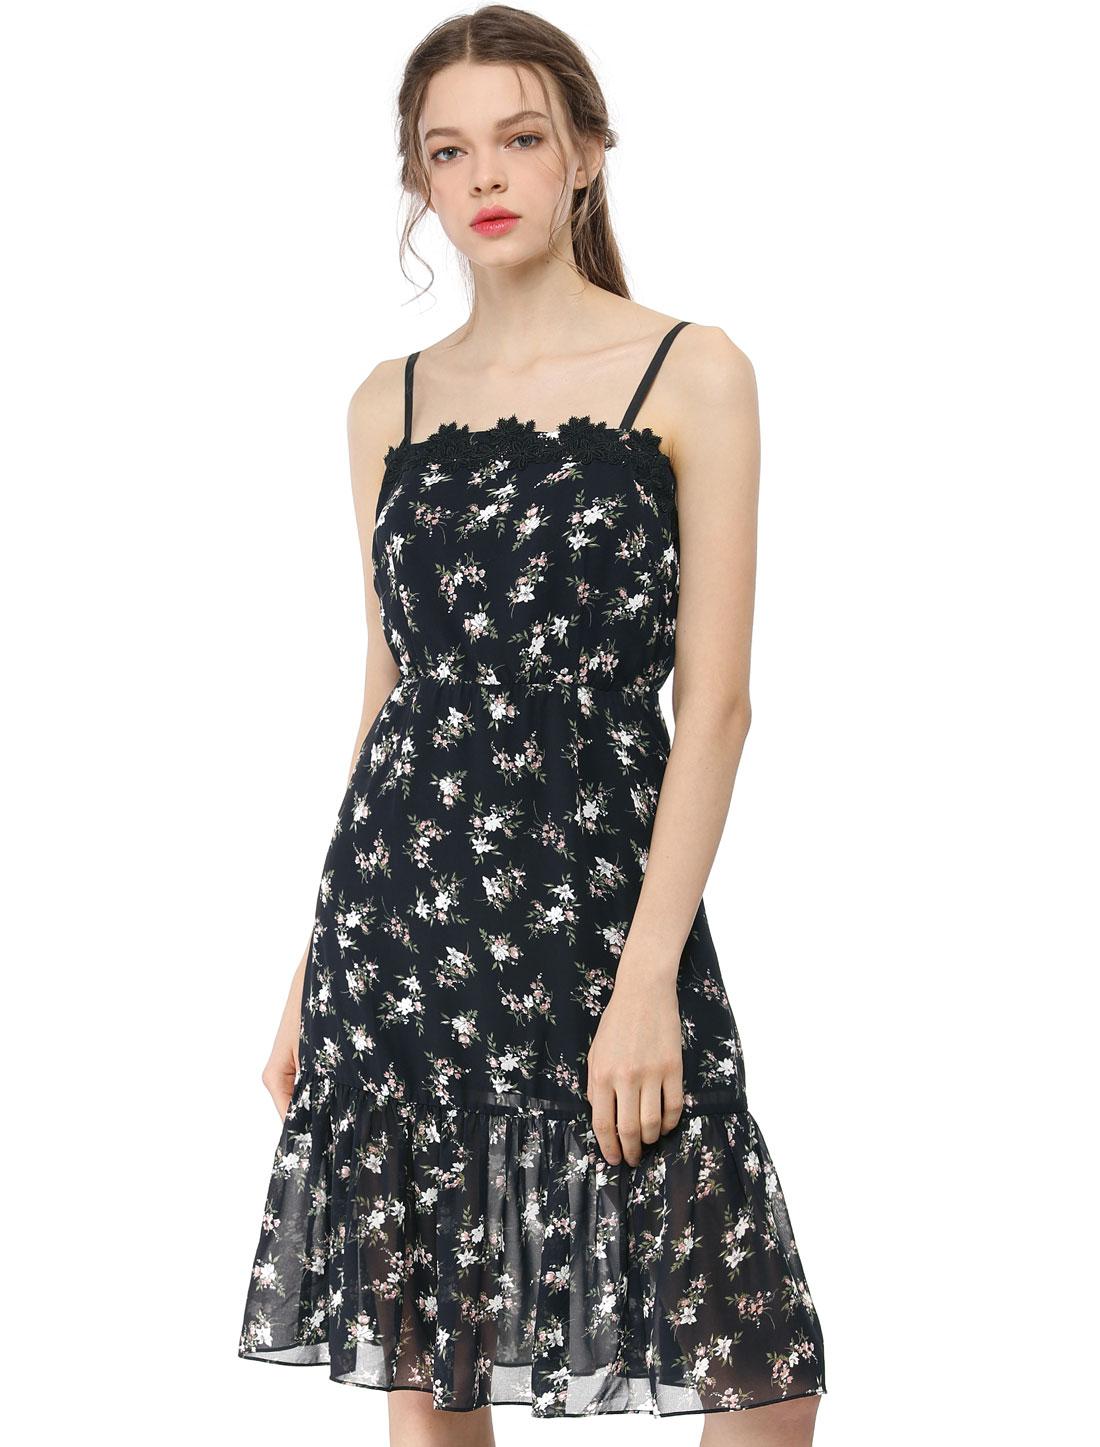 Allegra K Women's Chiffon Spaghetti Strap Midi Floral Dress Black S